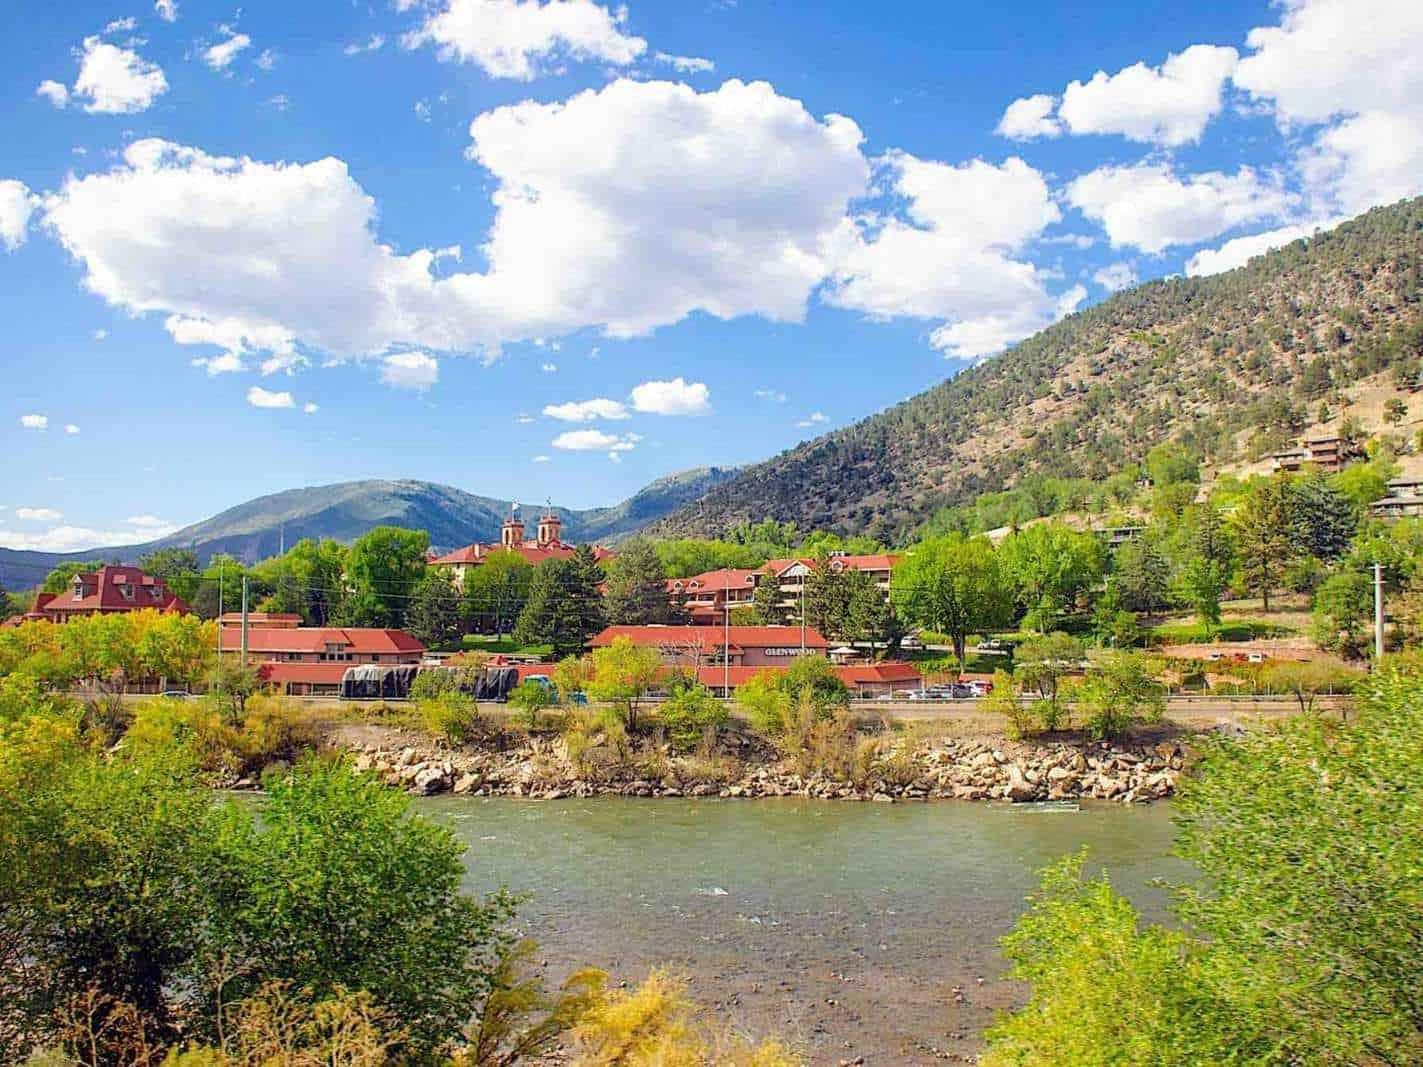 Glenwood Springs, Colorado.